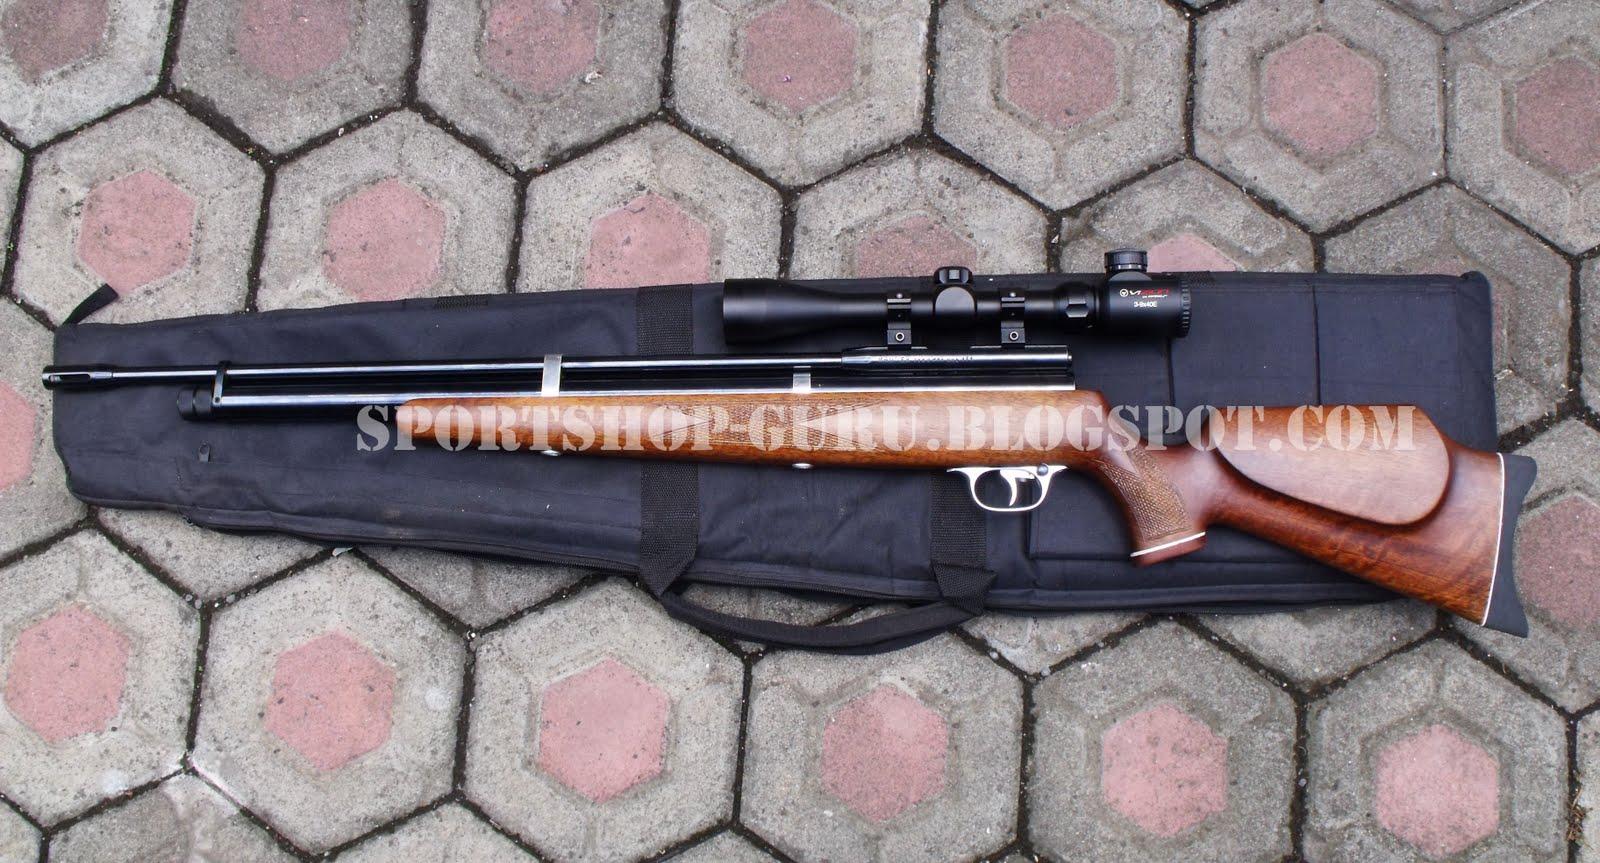 LIST SENAPAN ANGIN: Mouser Gun